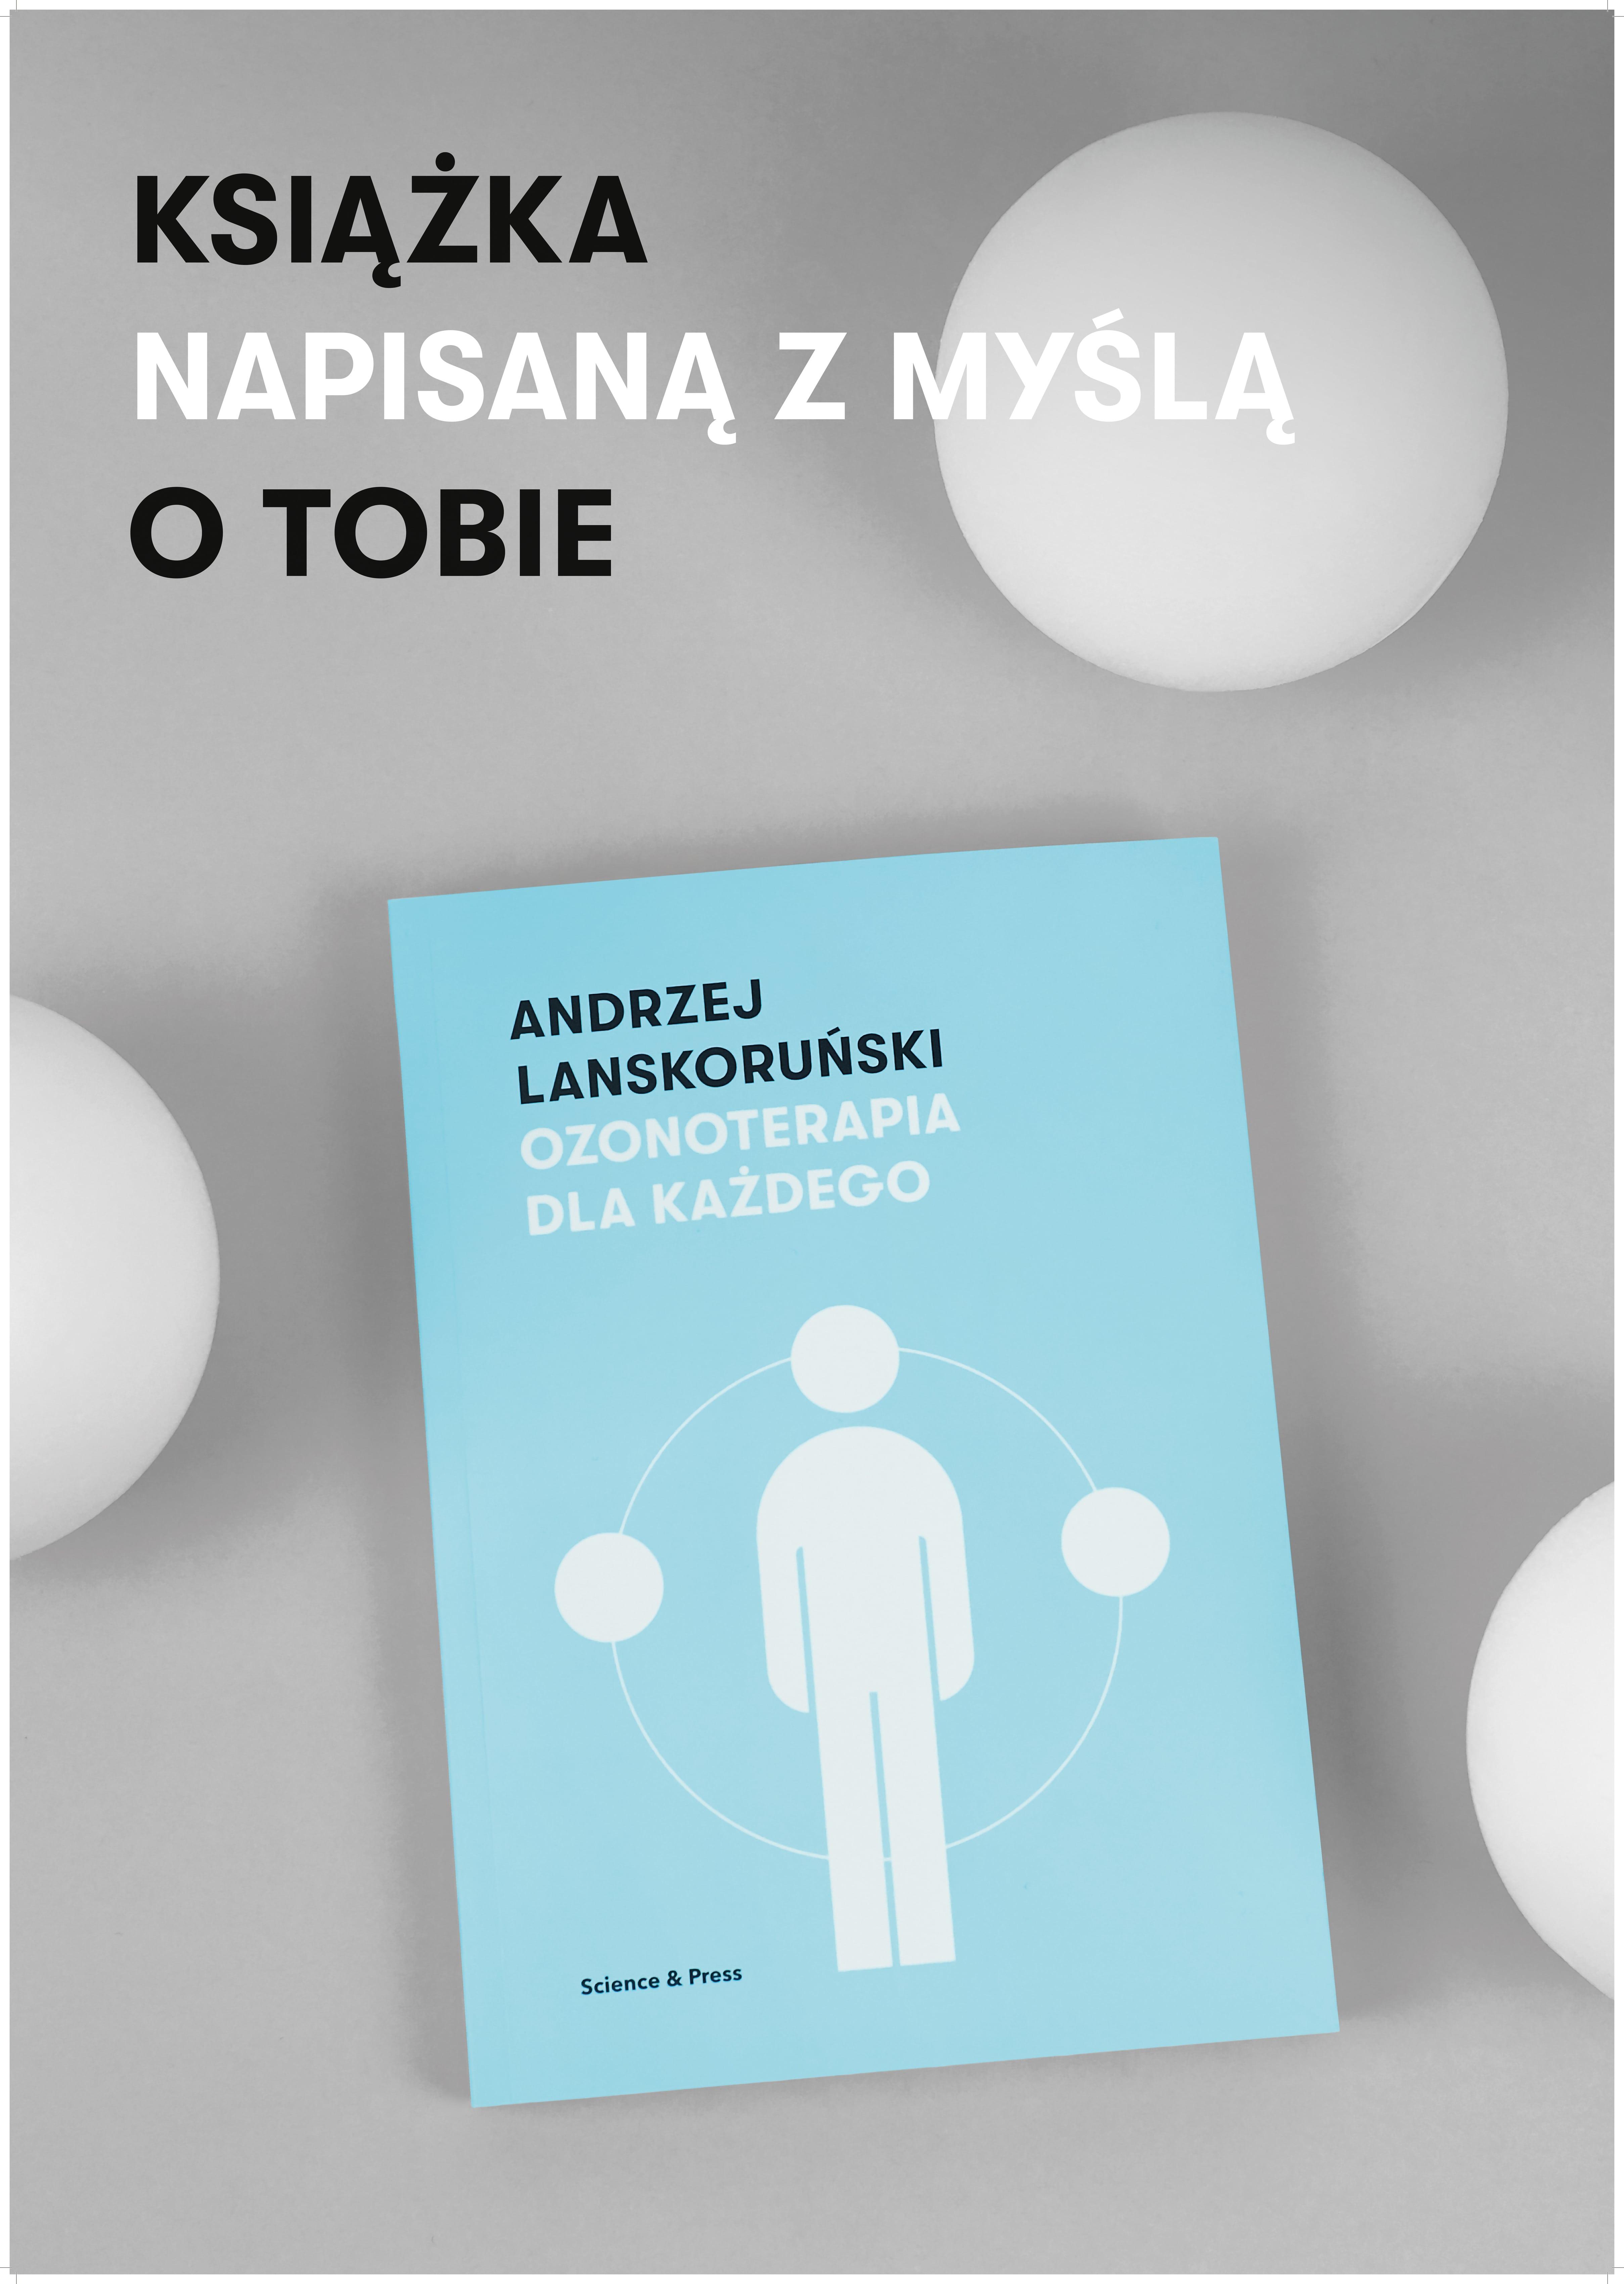 https://www.ozonoterapia.bydgoszcz.pl/wp-content/uploads/2018/12/Plakat-książka-JPEG-min.jpg